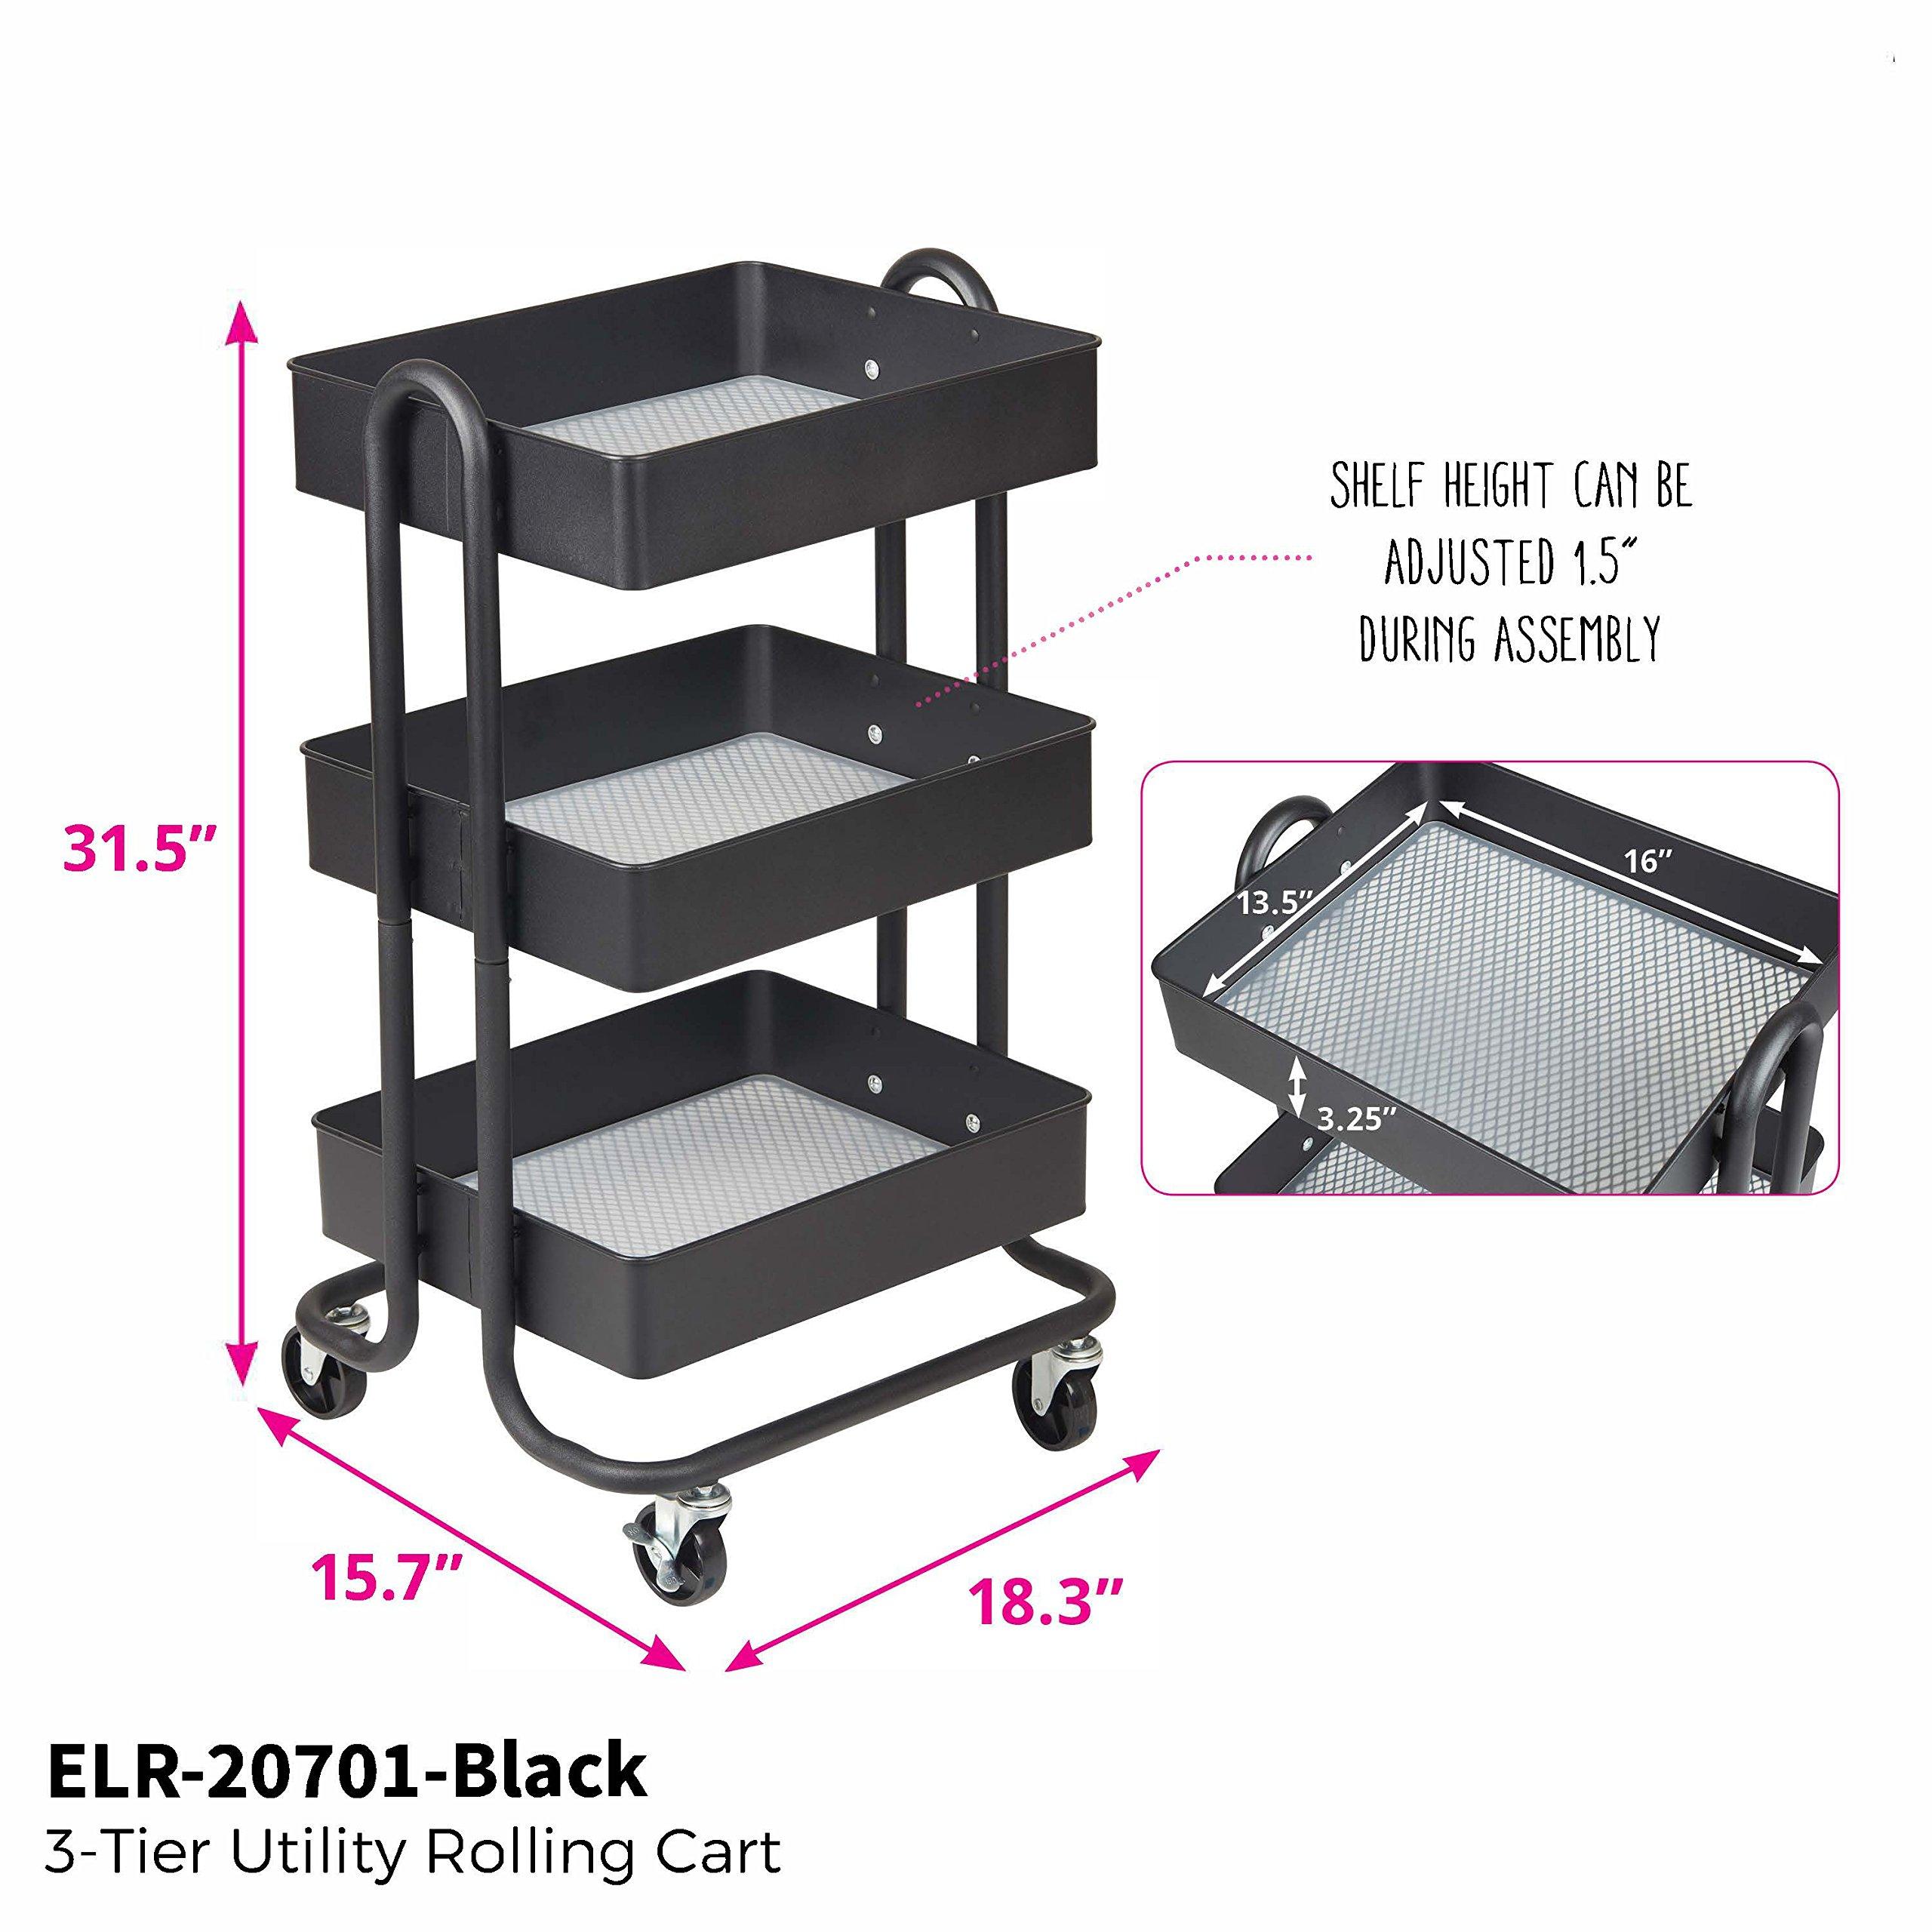 ECR4Kids 3-Tier Metal Rolling Utility Cart - Heavy Duty Mobile Storage Organizer, Black by ECR4Kids (Image #4)